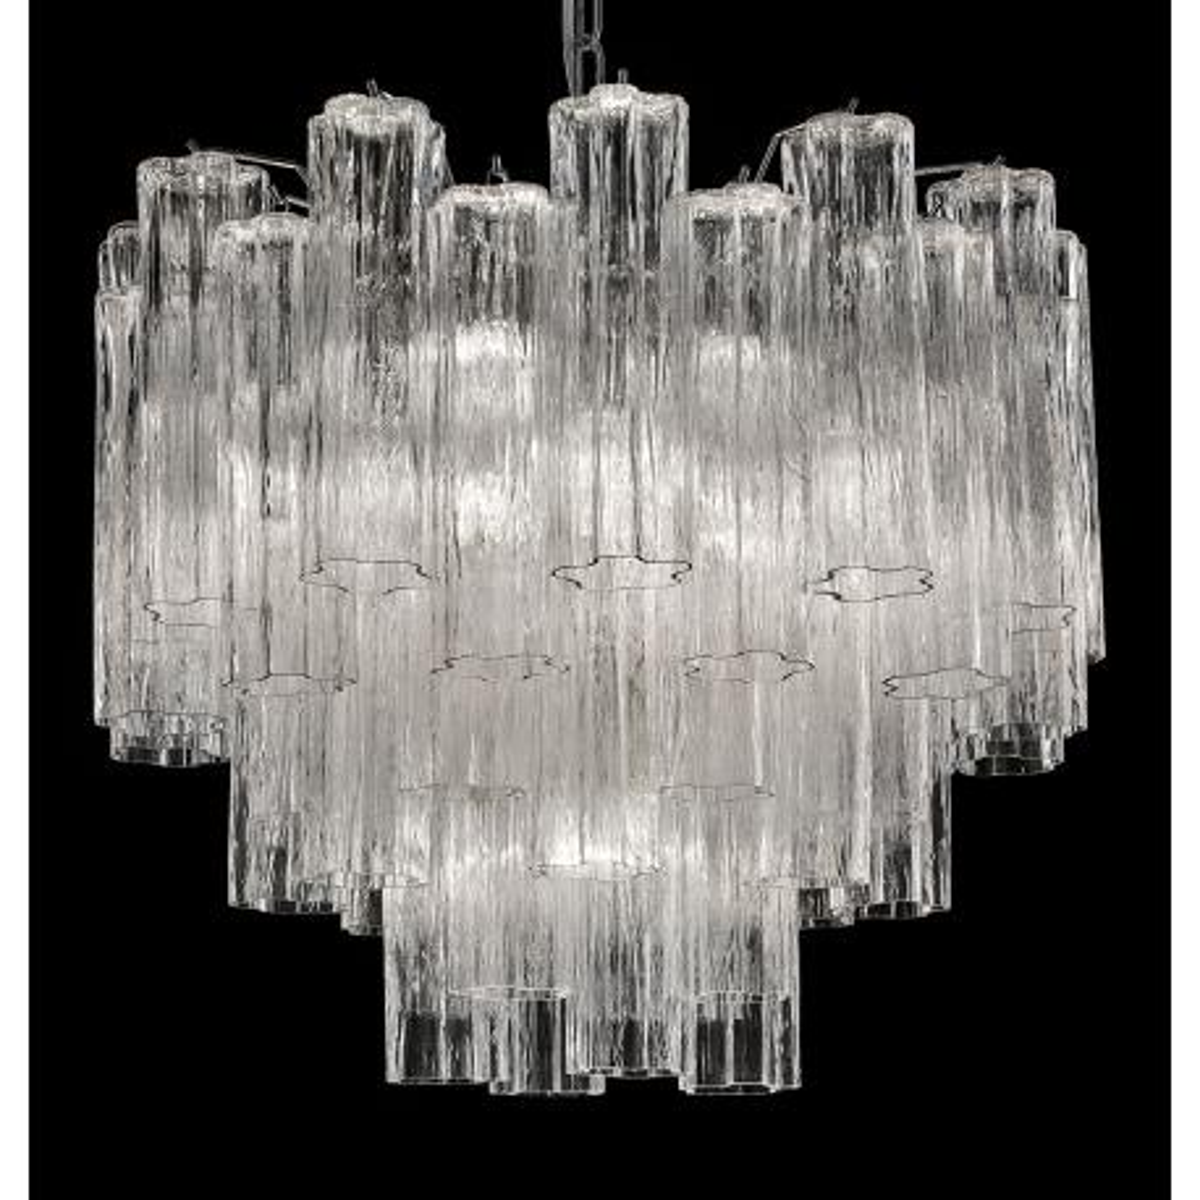 """Holly"" araña grande de cristal de Murano - 7 luces - transparente y cromo"